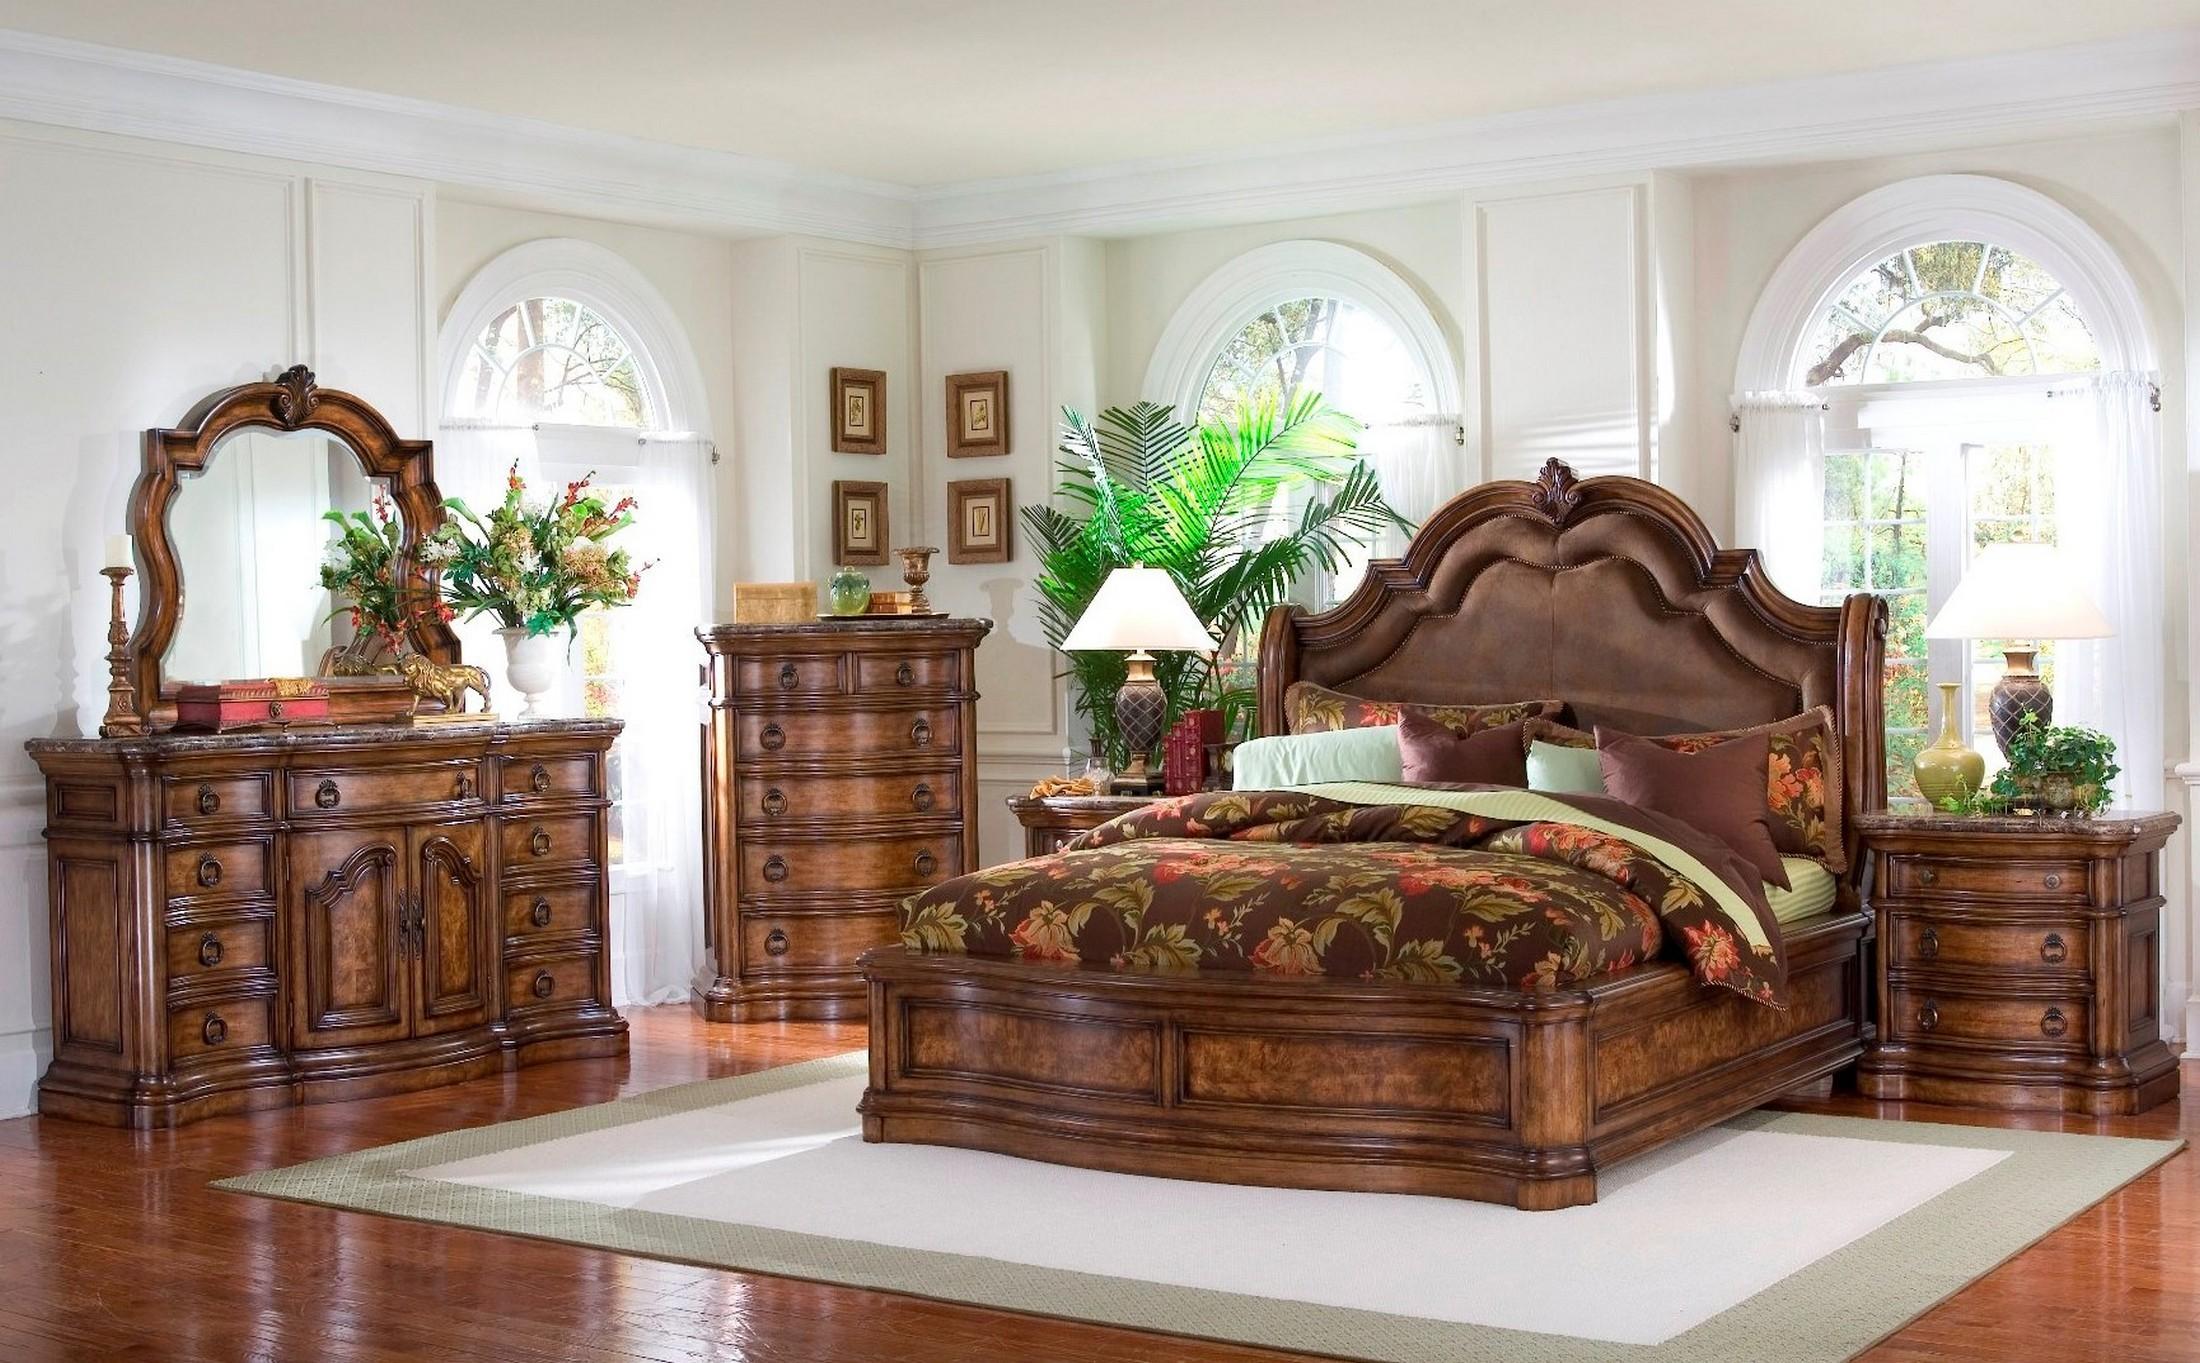 San Mateo Sleigh Bedroom Set From Pulaski 662170 662171 662172 Coleman Fu